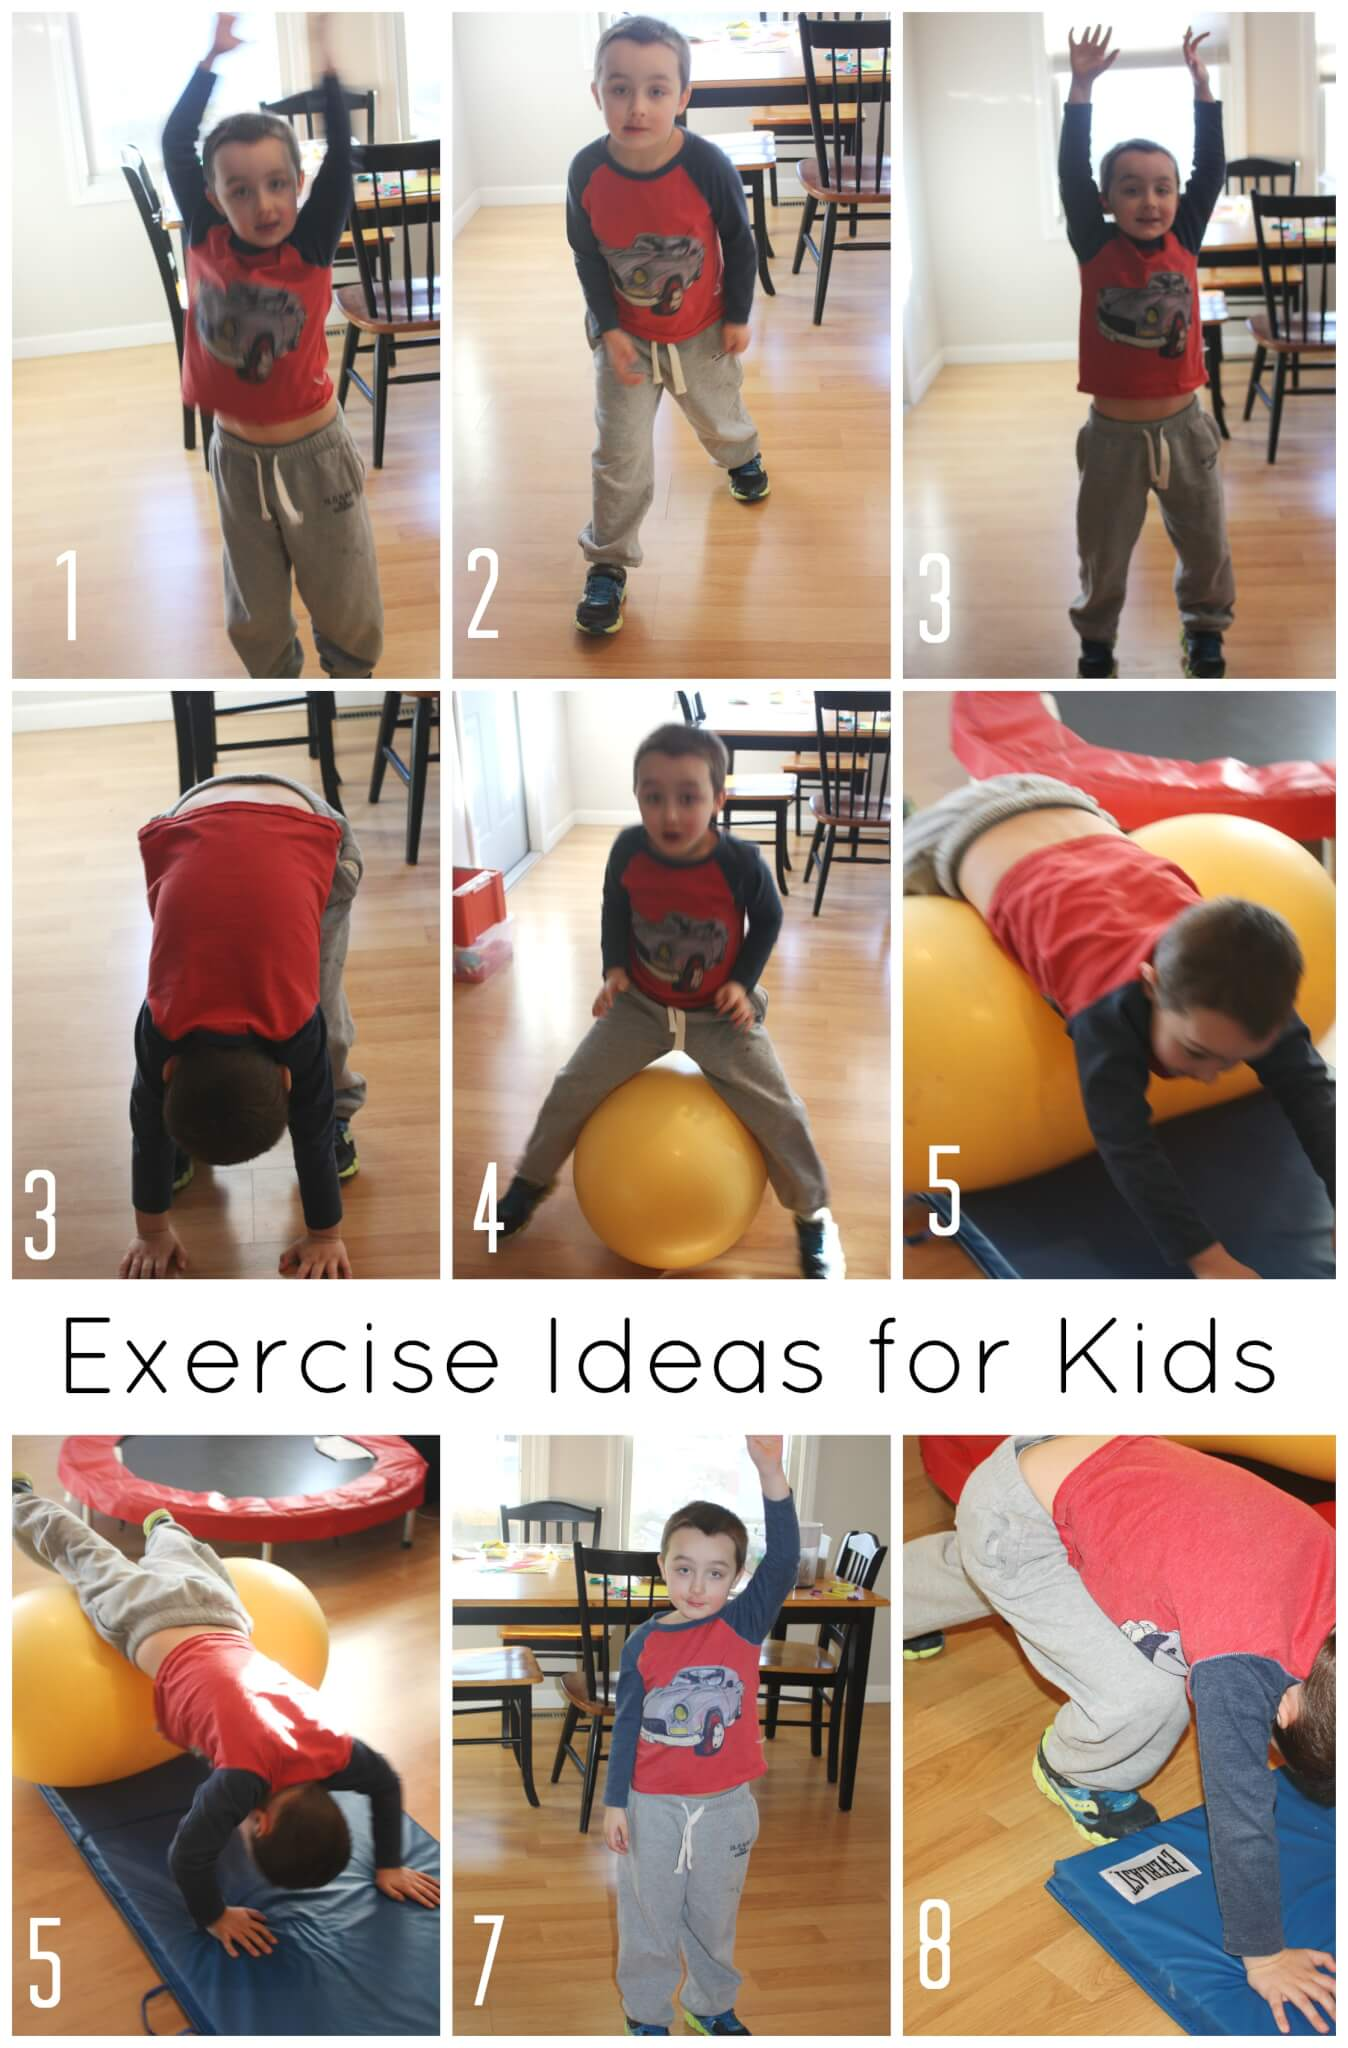 Kids Exercises For High Energy Indoor Gross Motor Play